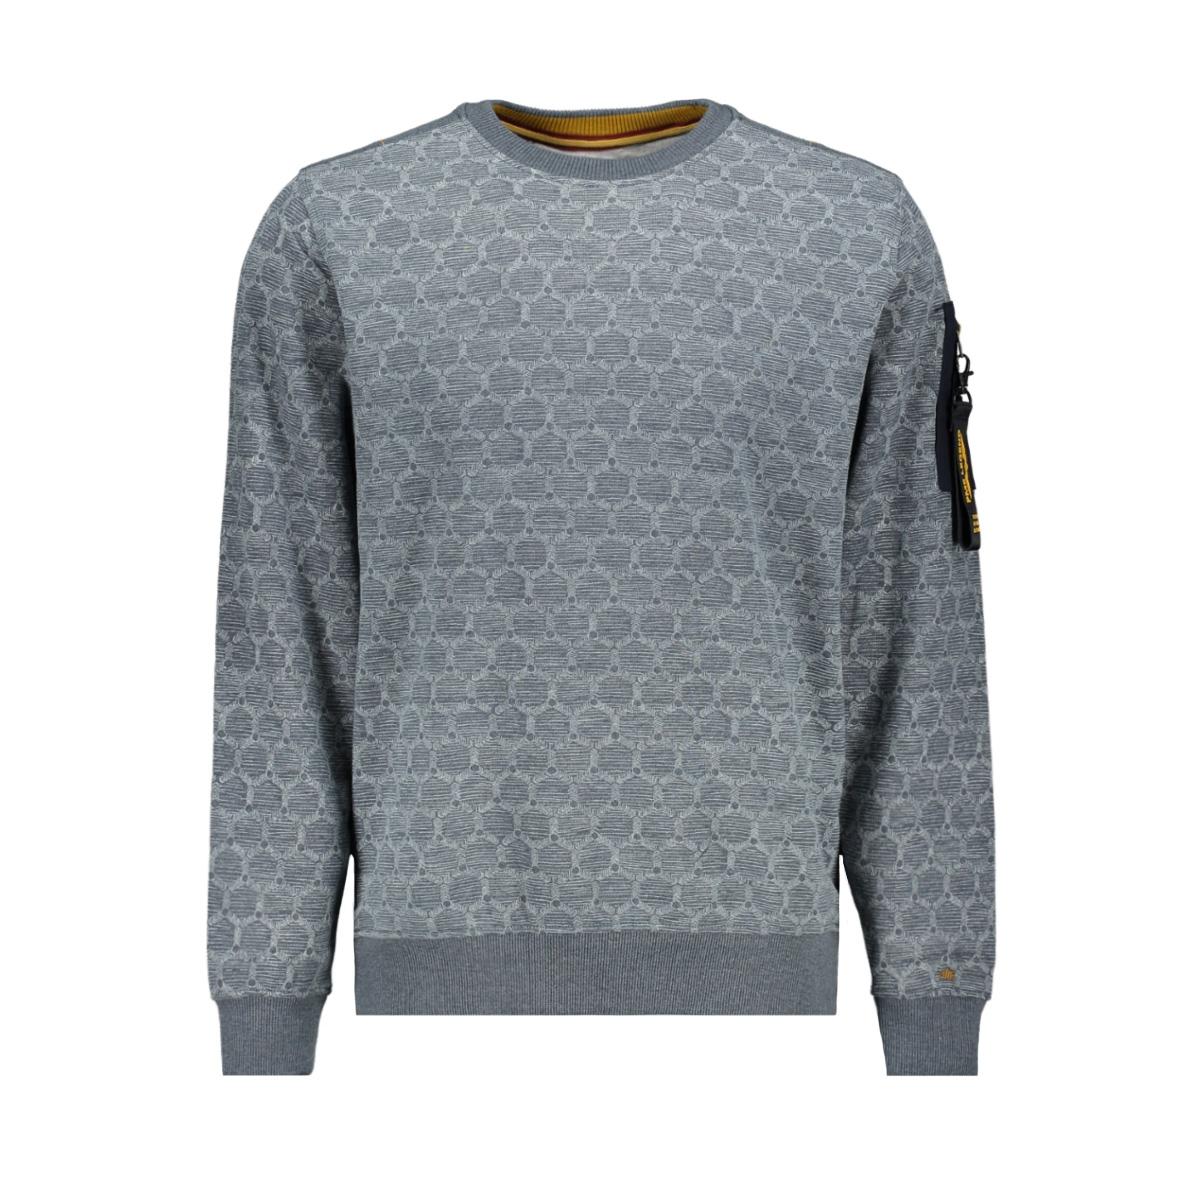 sweater psw196426 pme legend sweater 5126